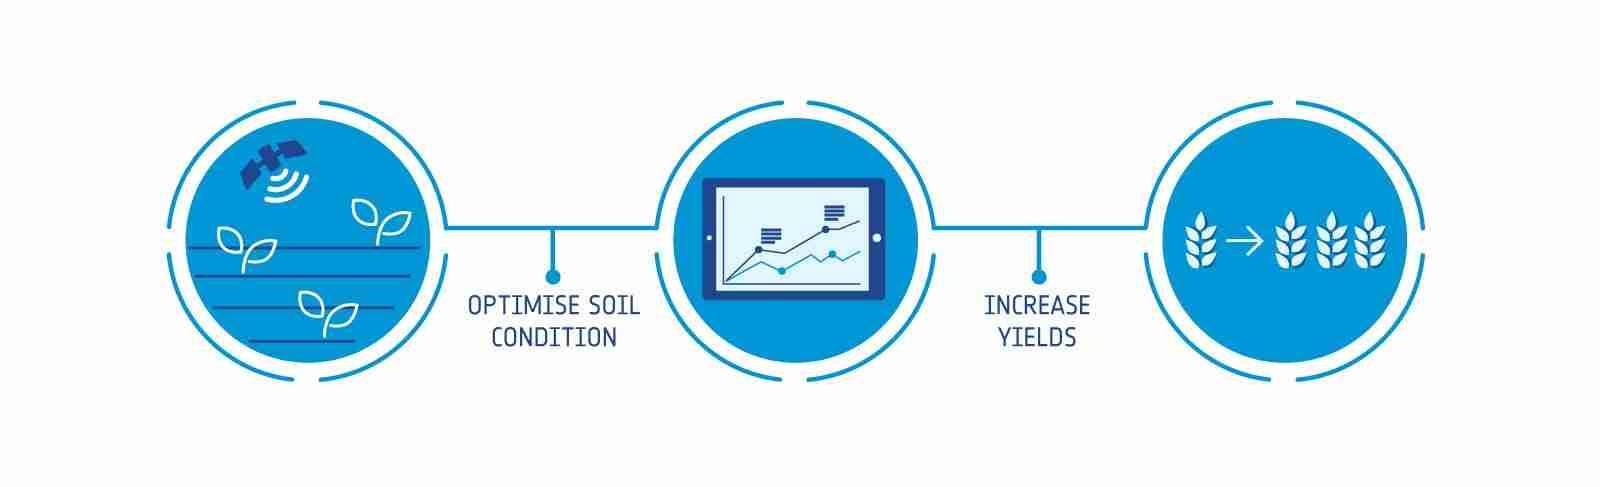 Optimise Soil Condition